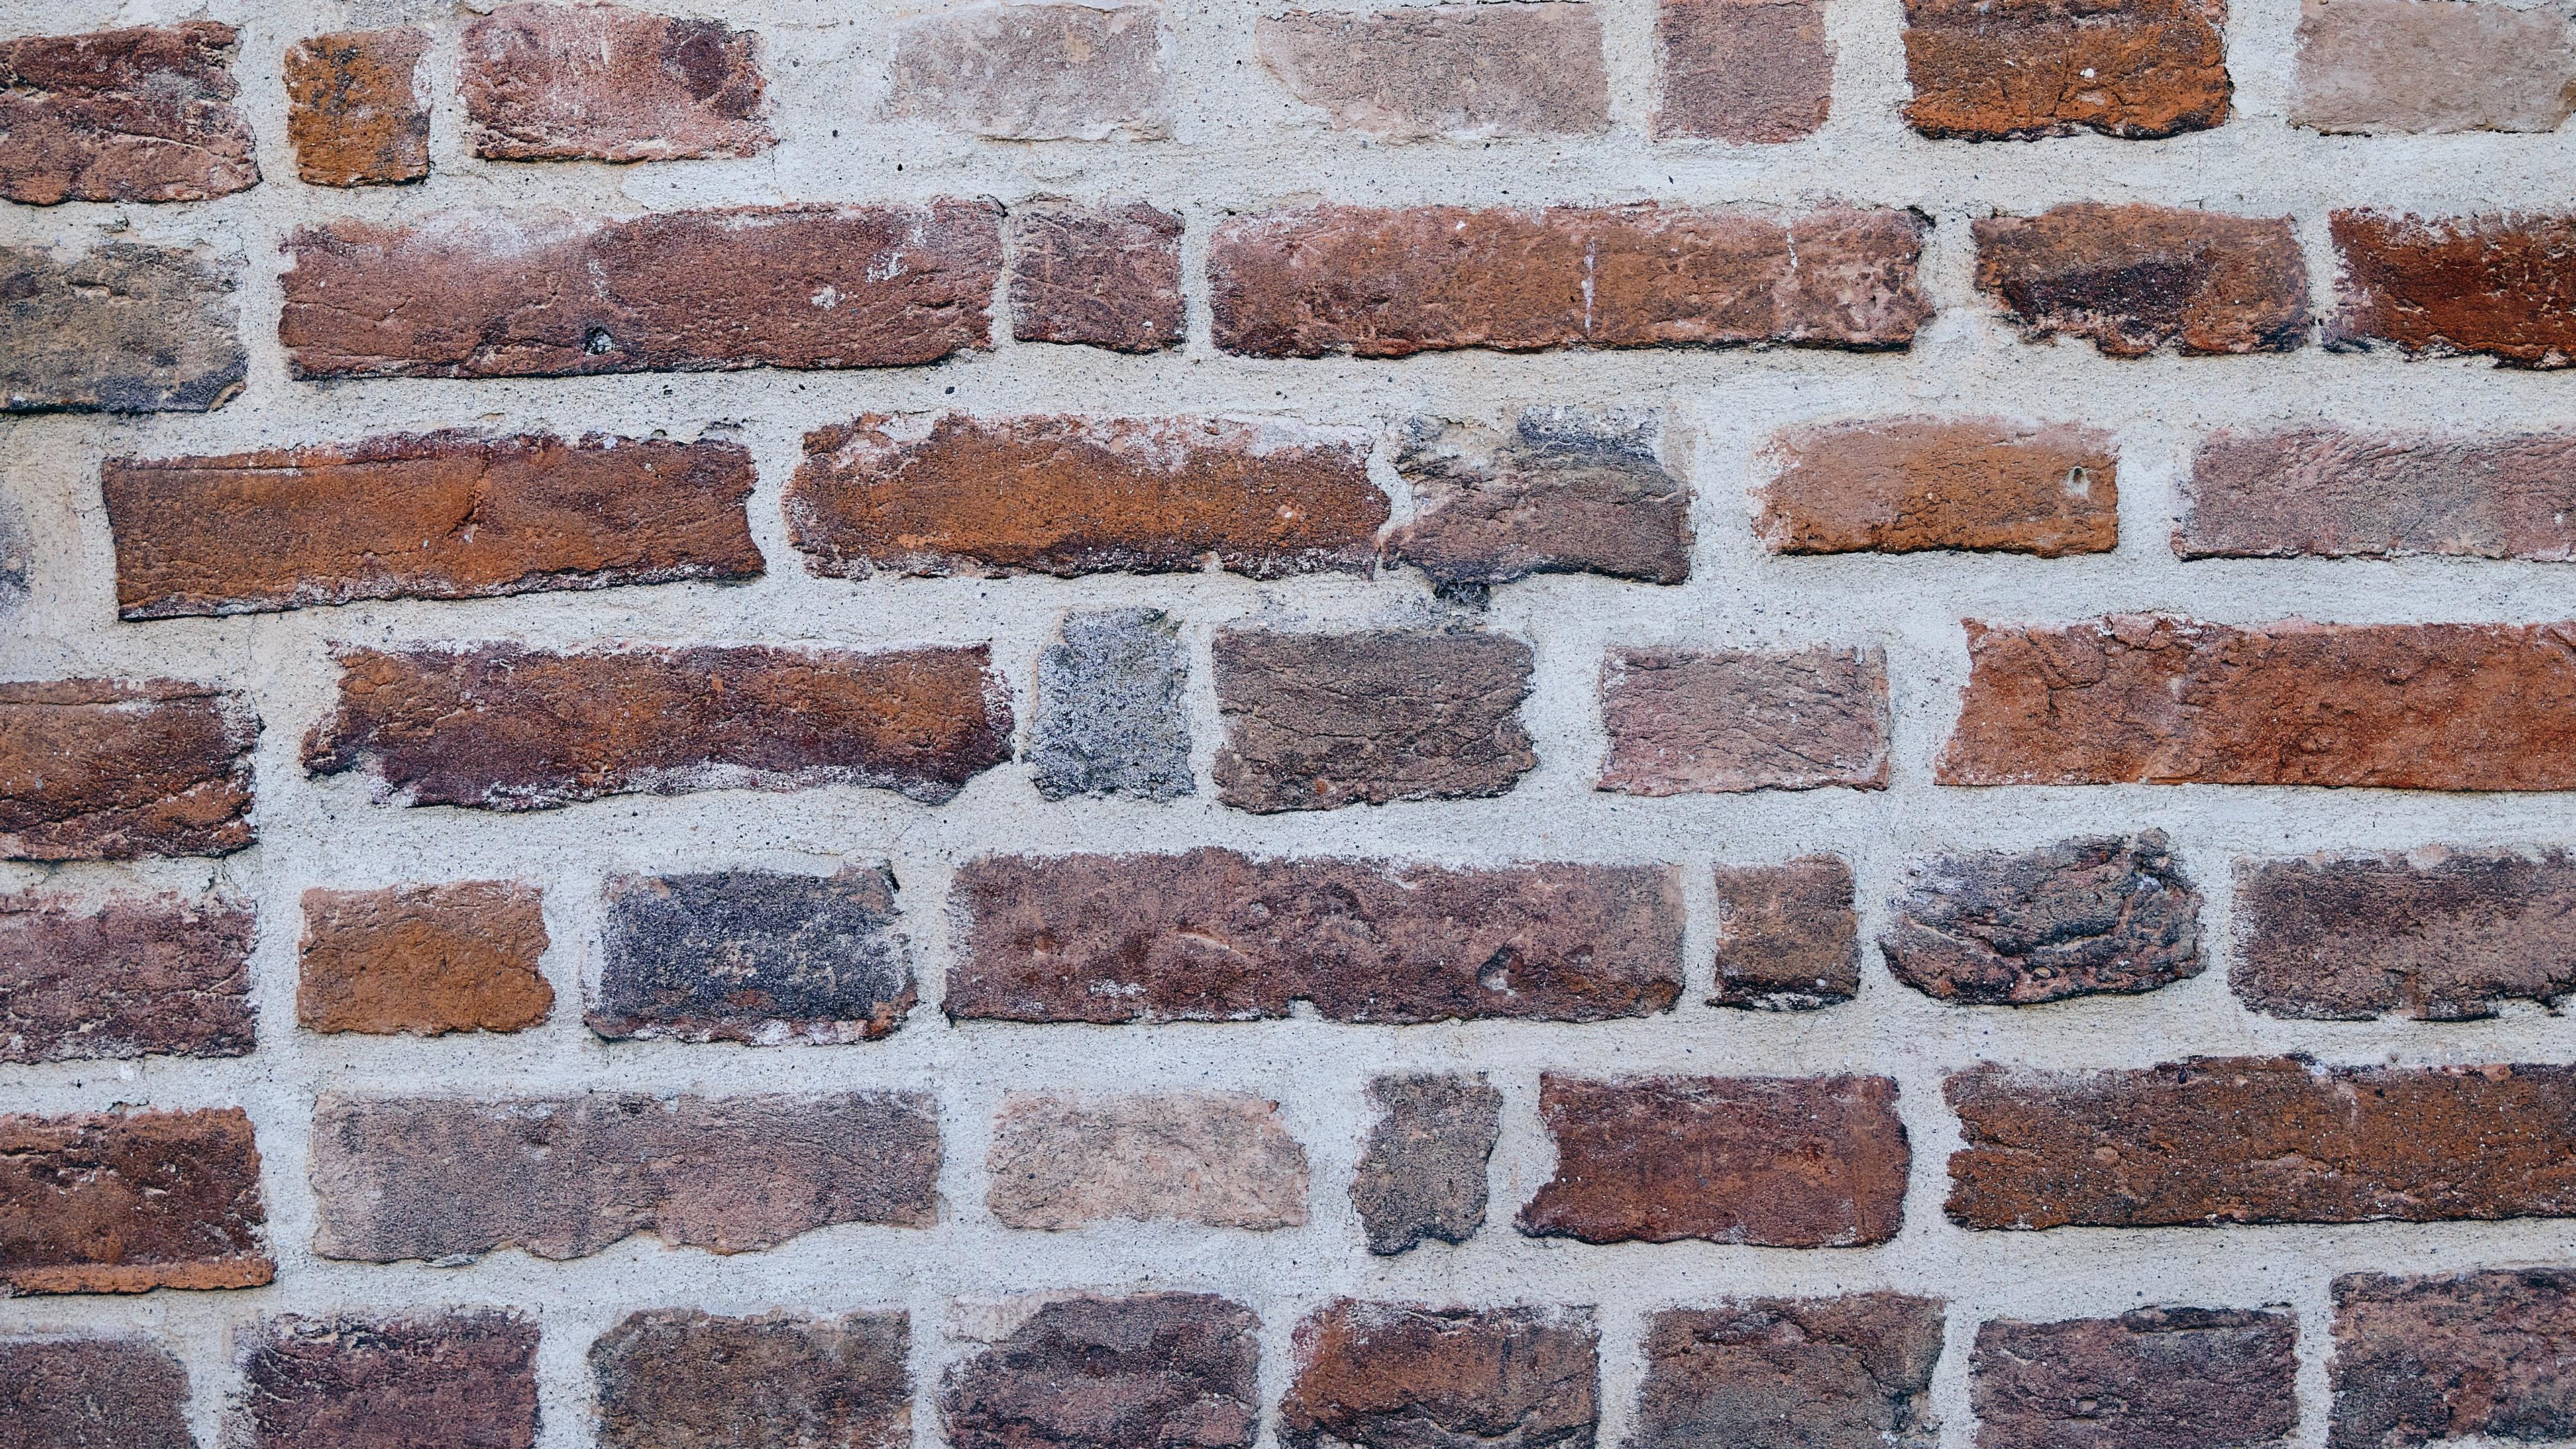 texture wall brick 4k 1536097835 - texture, wall, brick 4k - WALL, Texture, brick